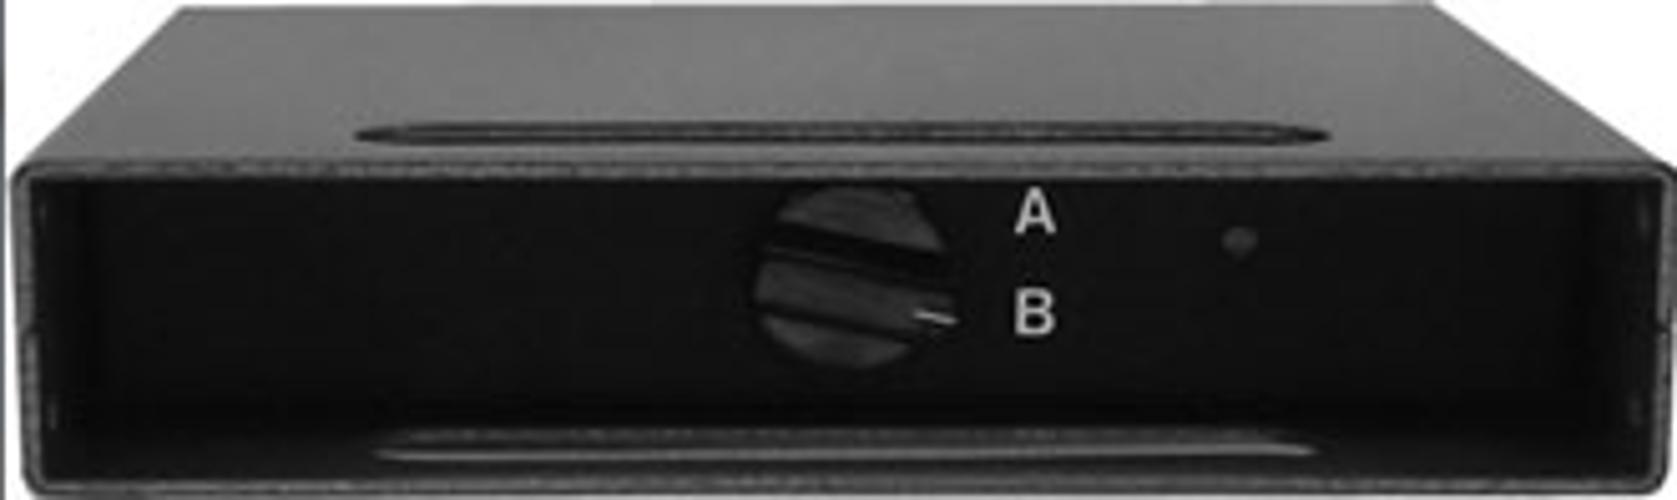 DMX A/B Switch Box